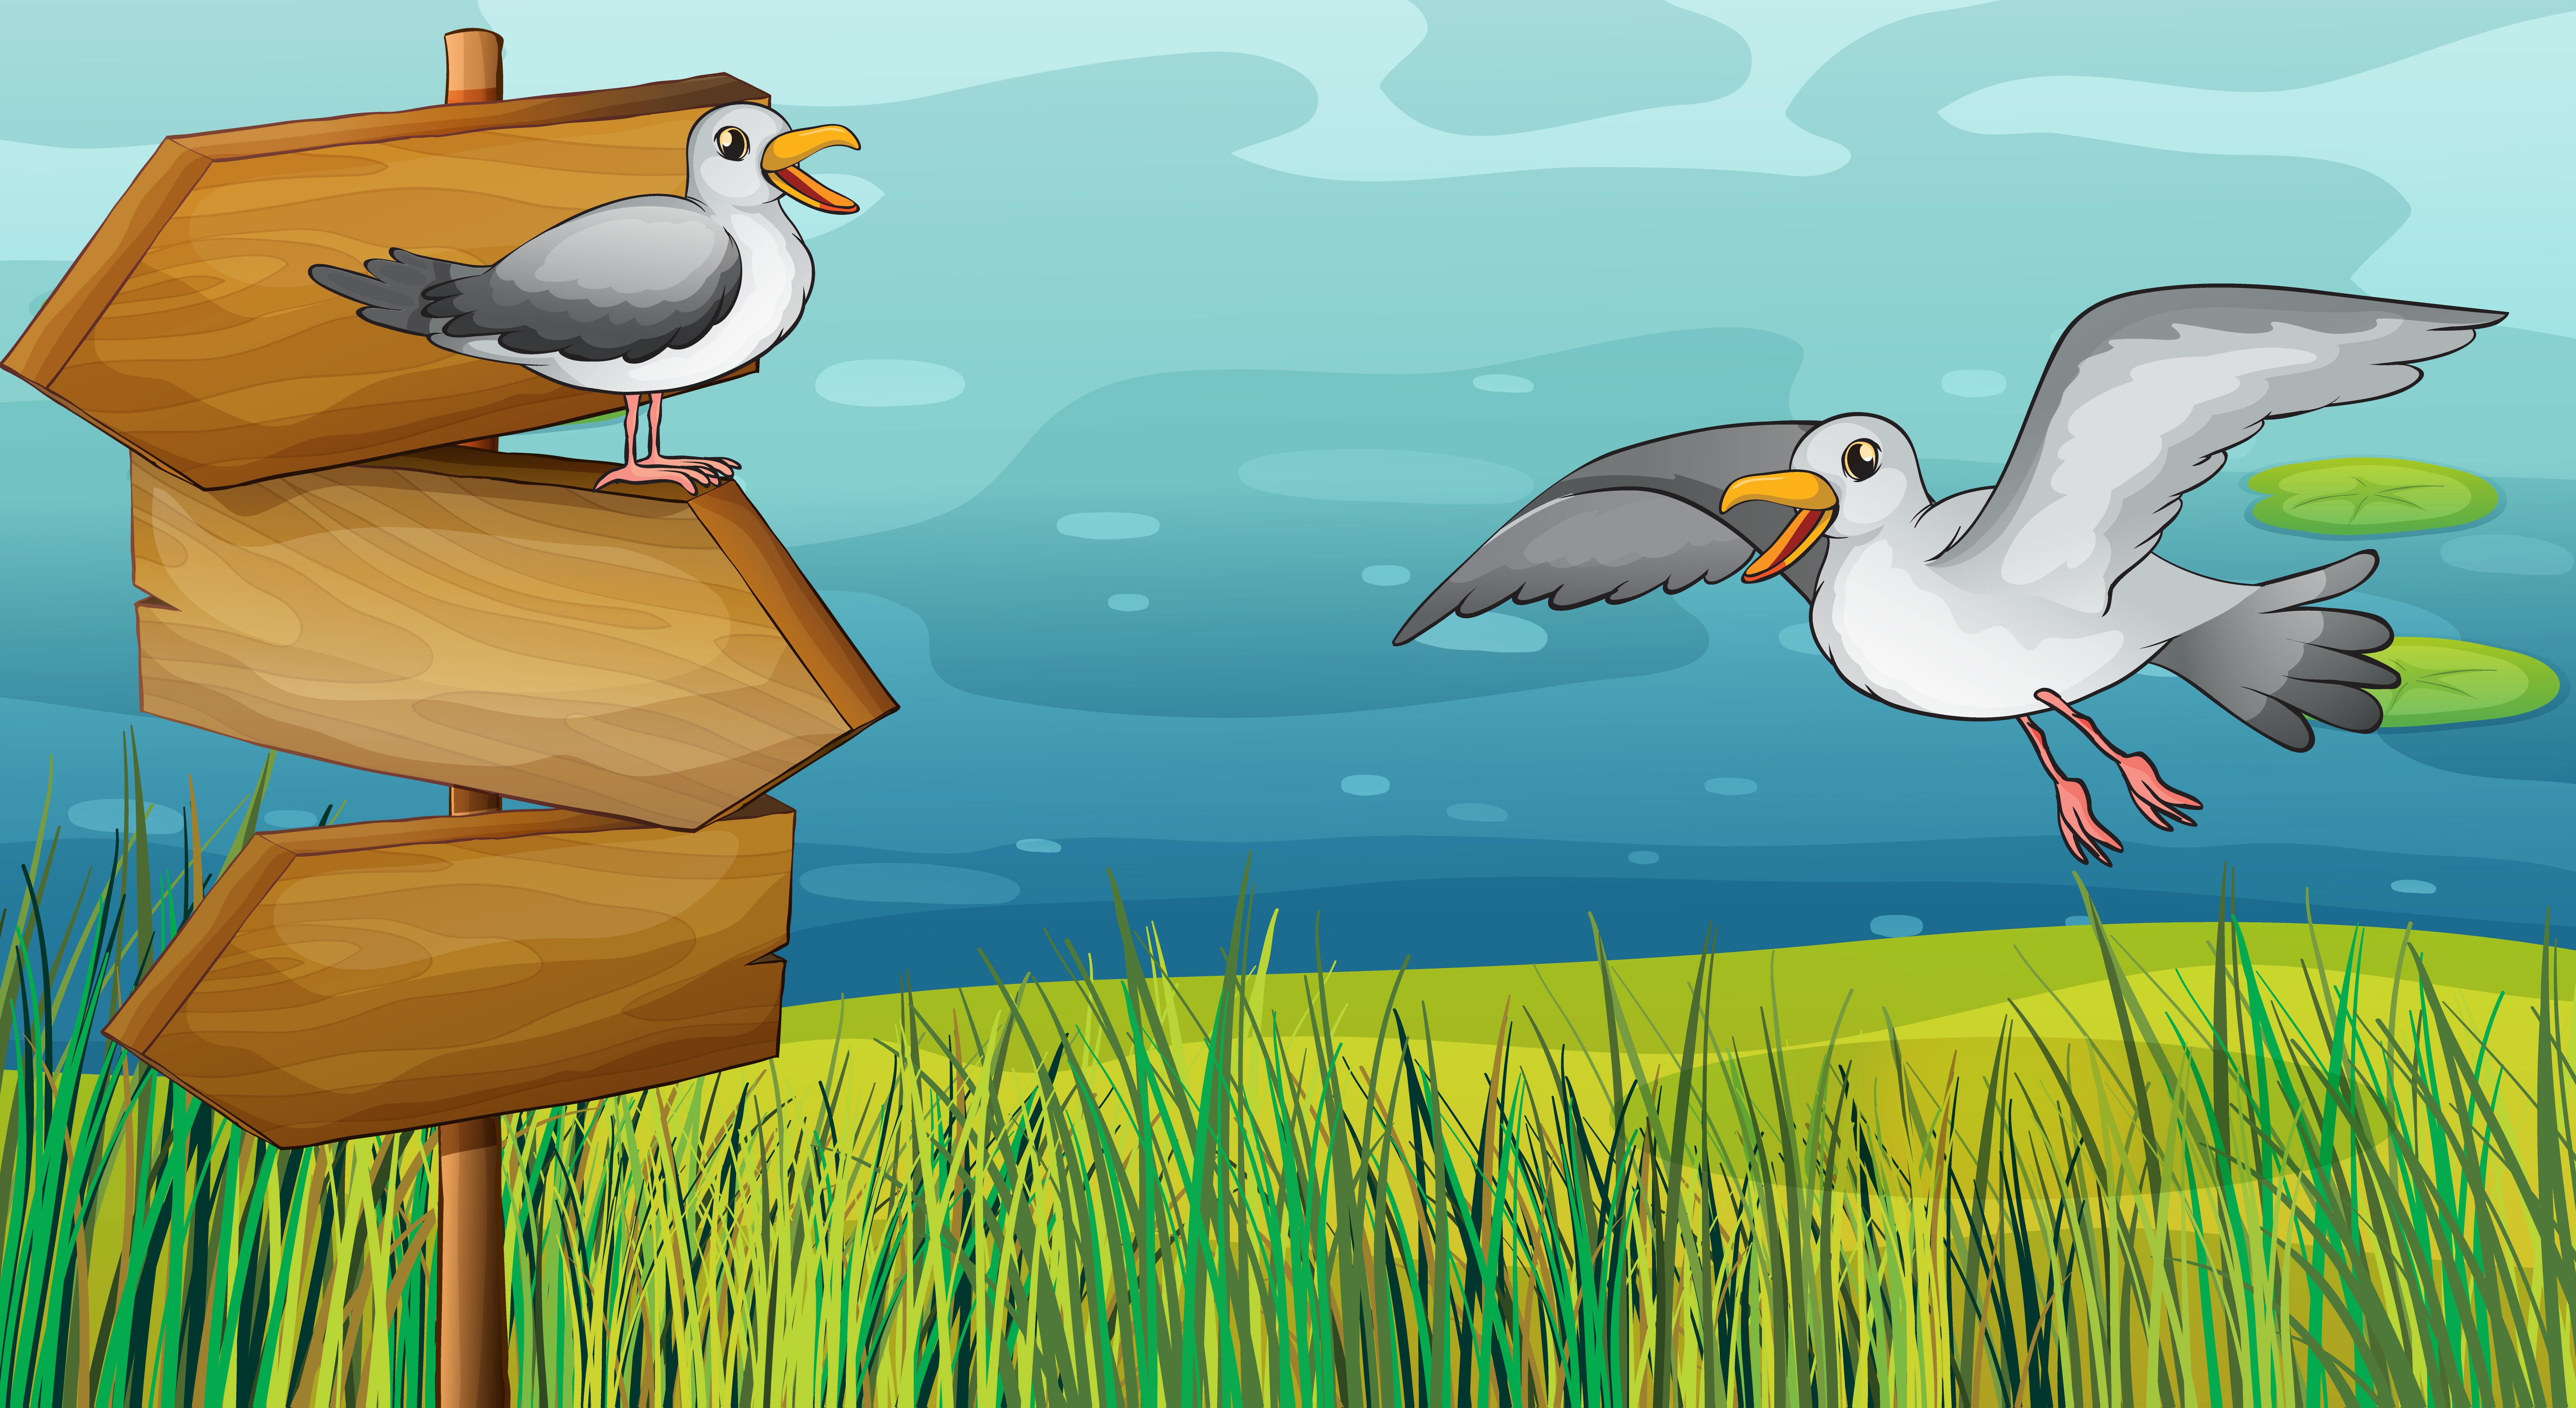 Two chirping birds 522733 - Download Free Vectors, Clipart ... (7316 x 3999 Pixel)